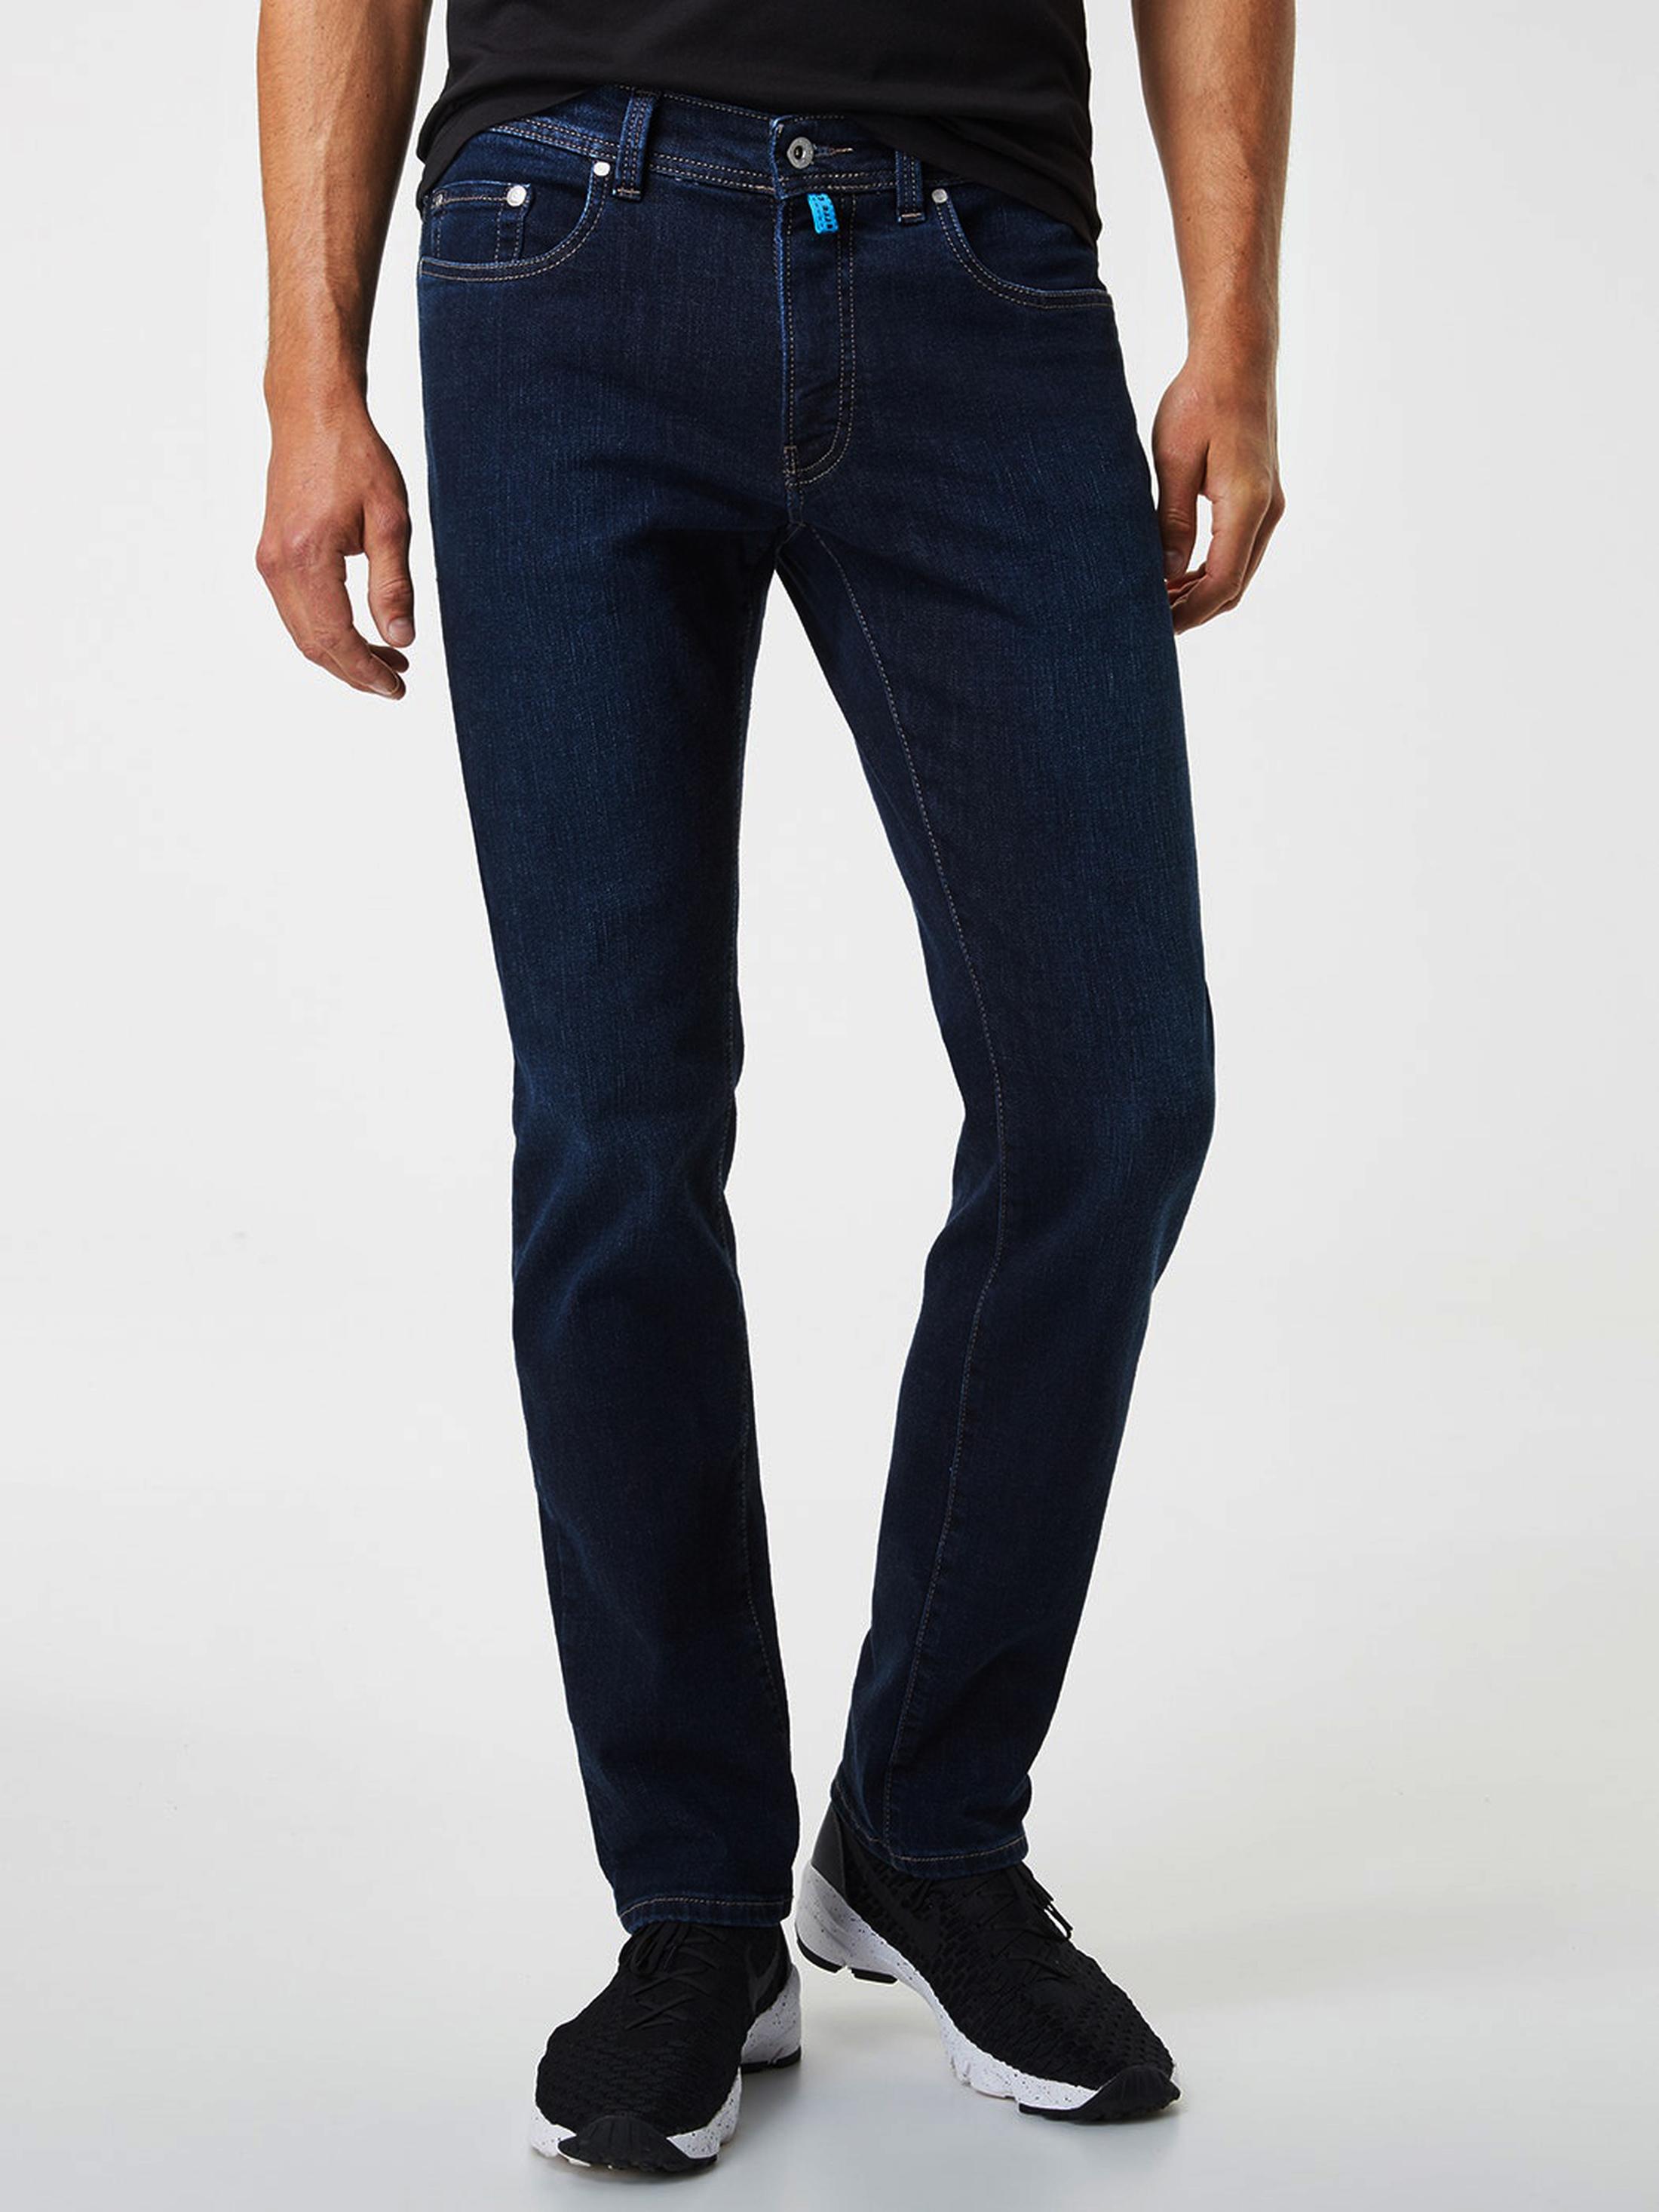 Pierre Cardin Lyon Jeans Future Flex 04